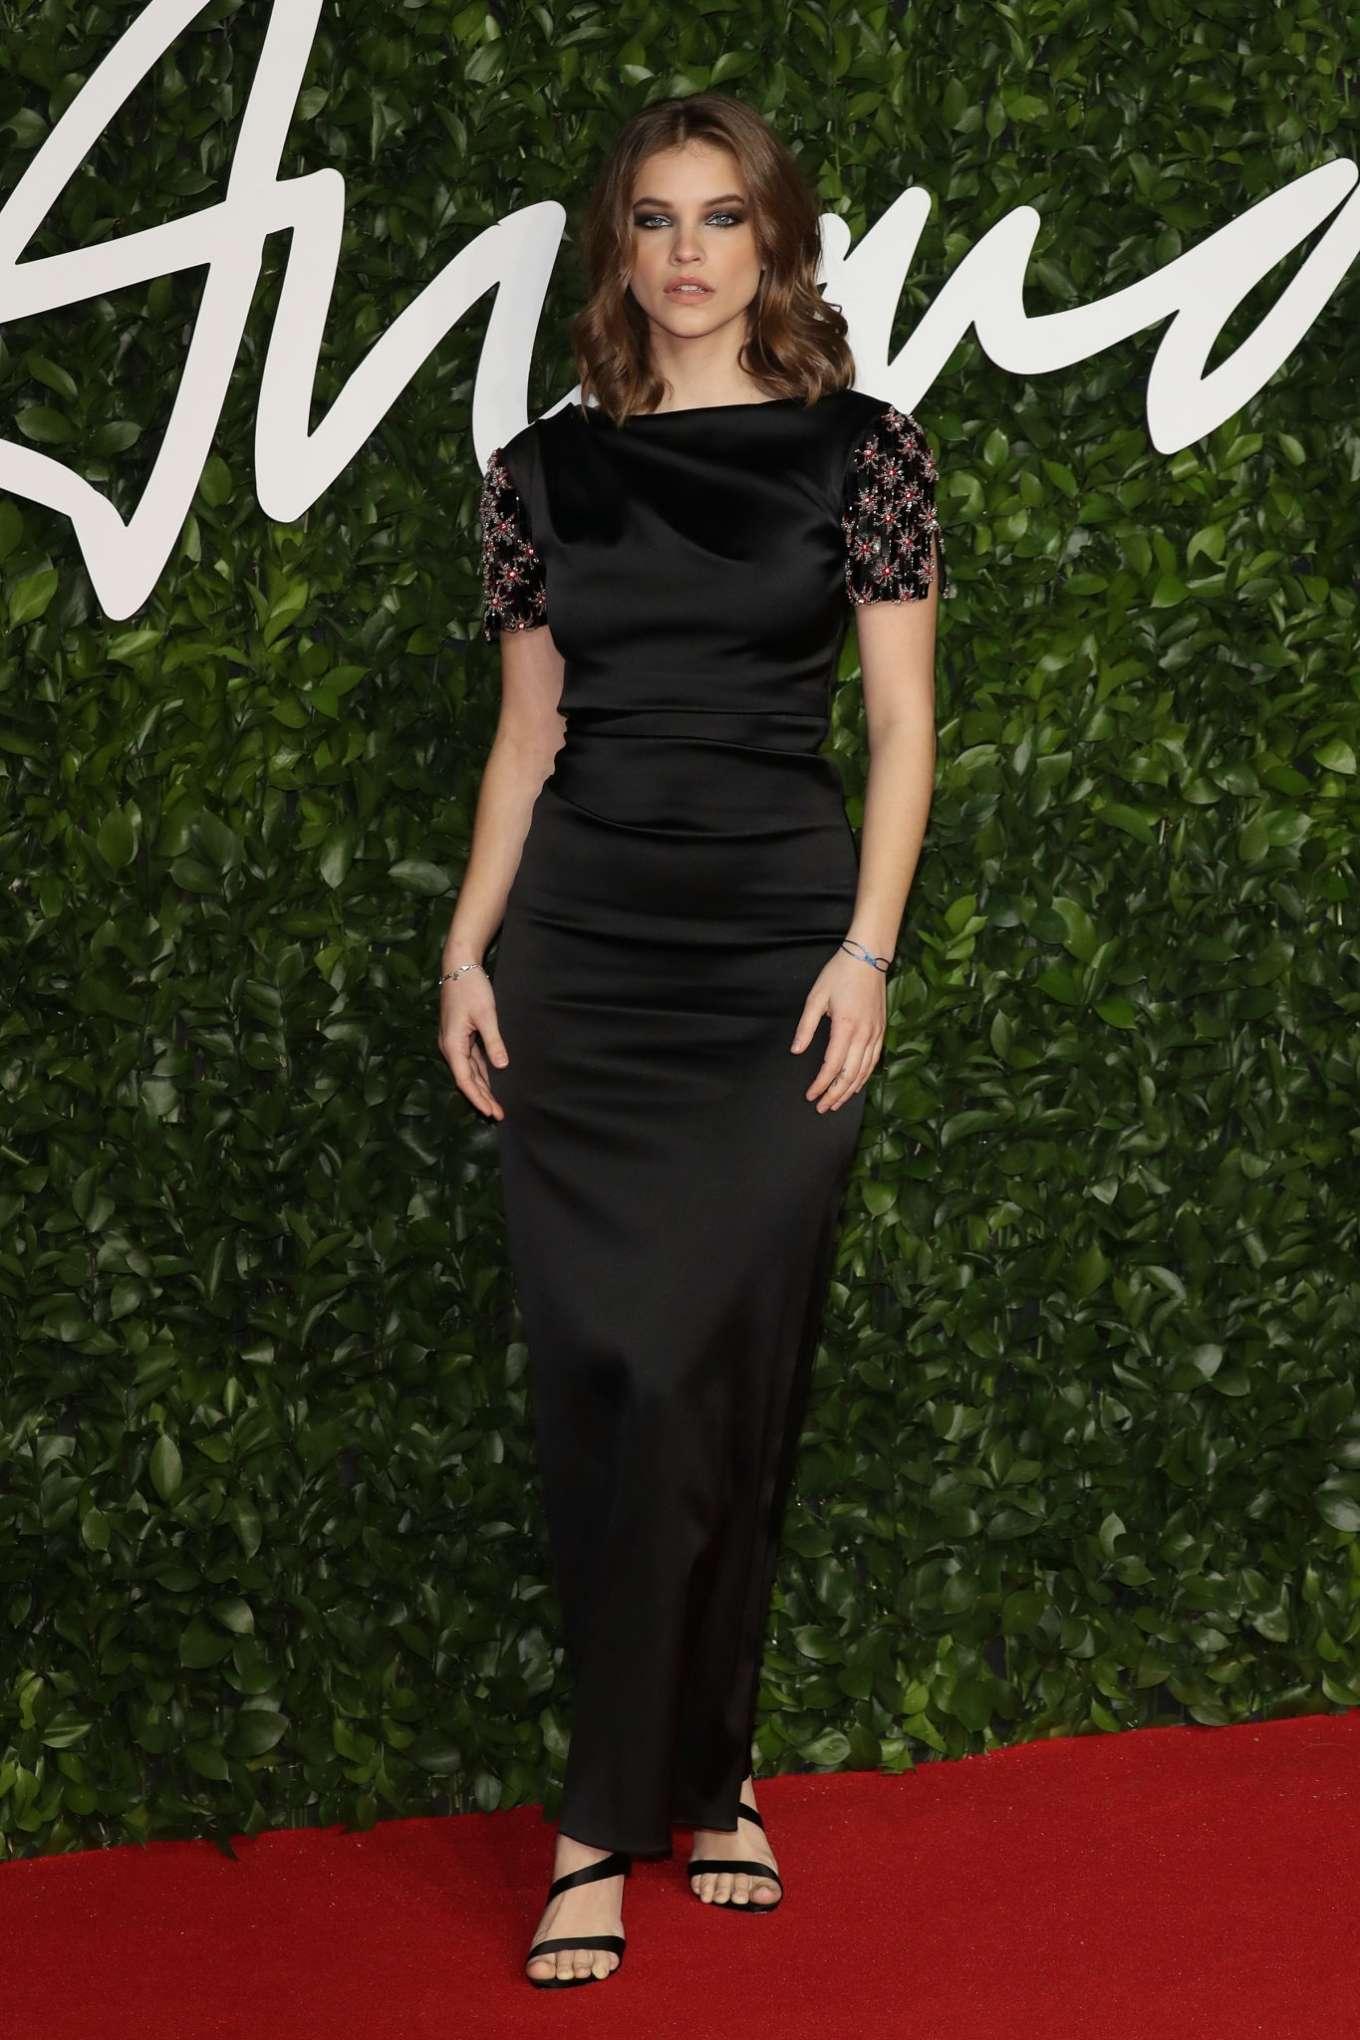 Barbara Palvin 2019 : Barbara Palvin – Fashion Awards 2019 in London-16